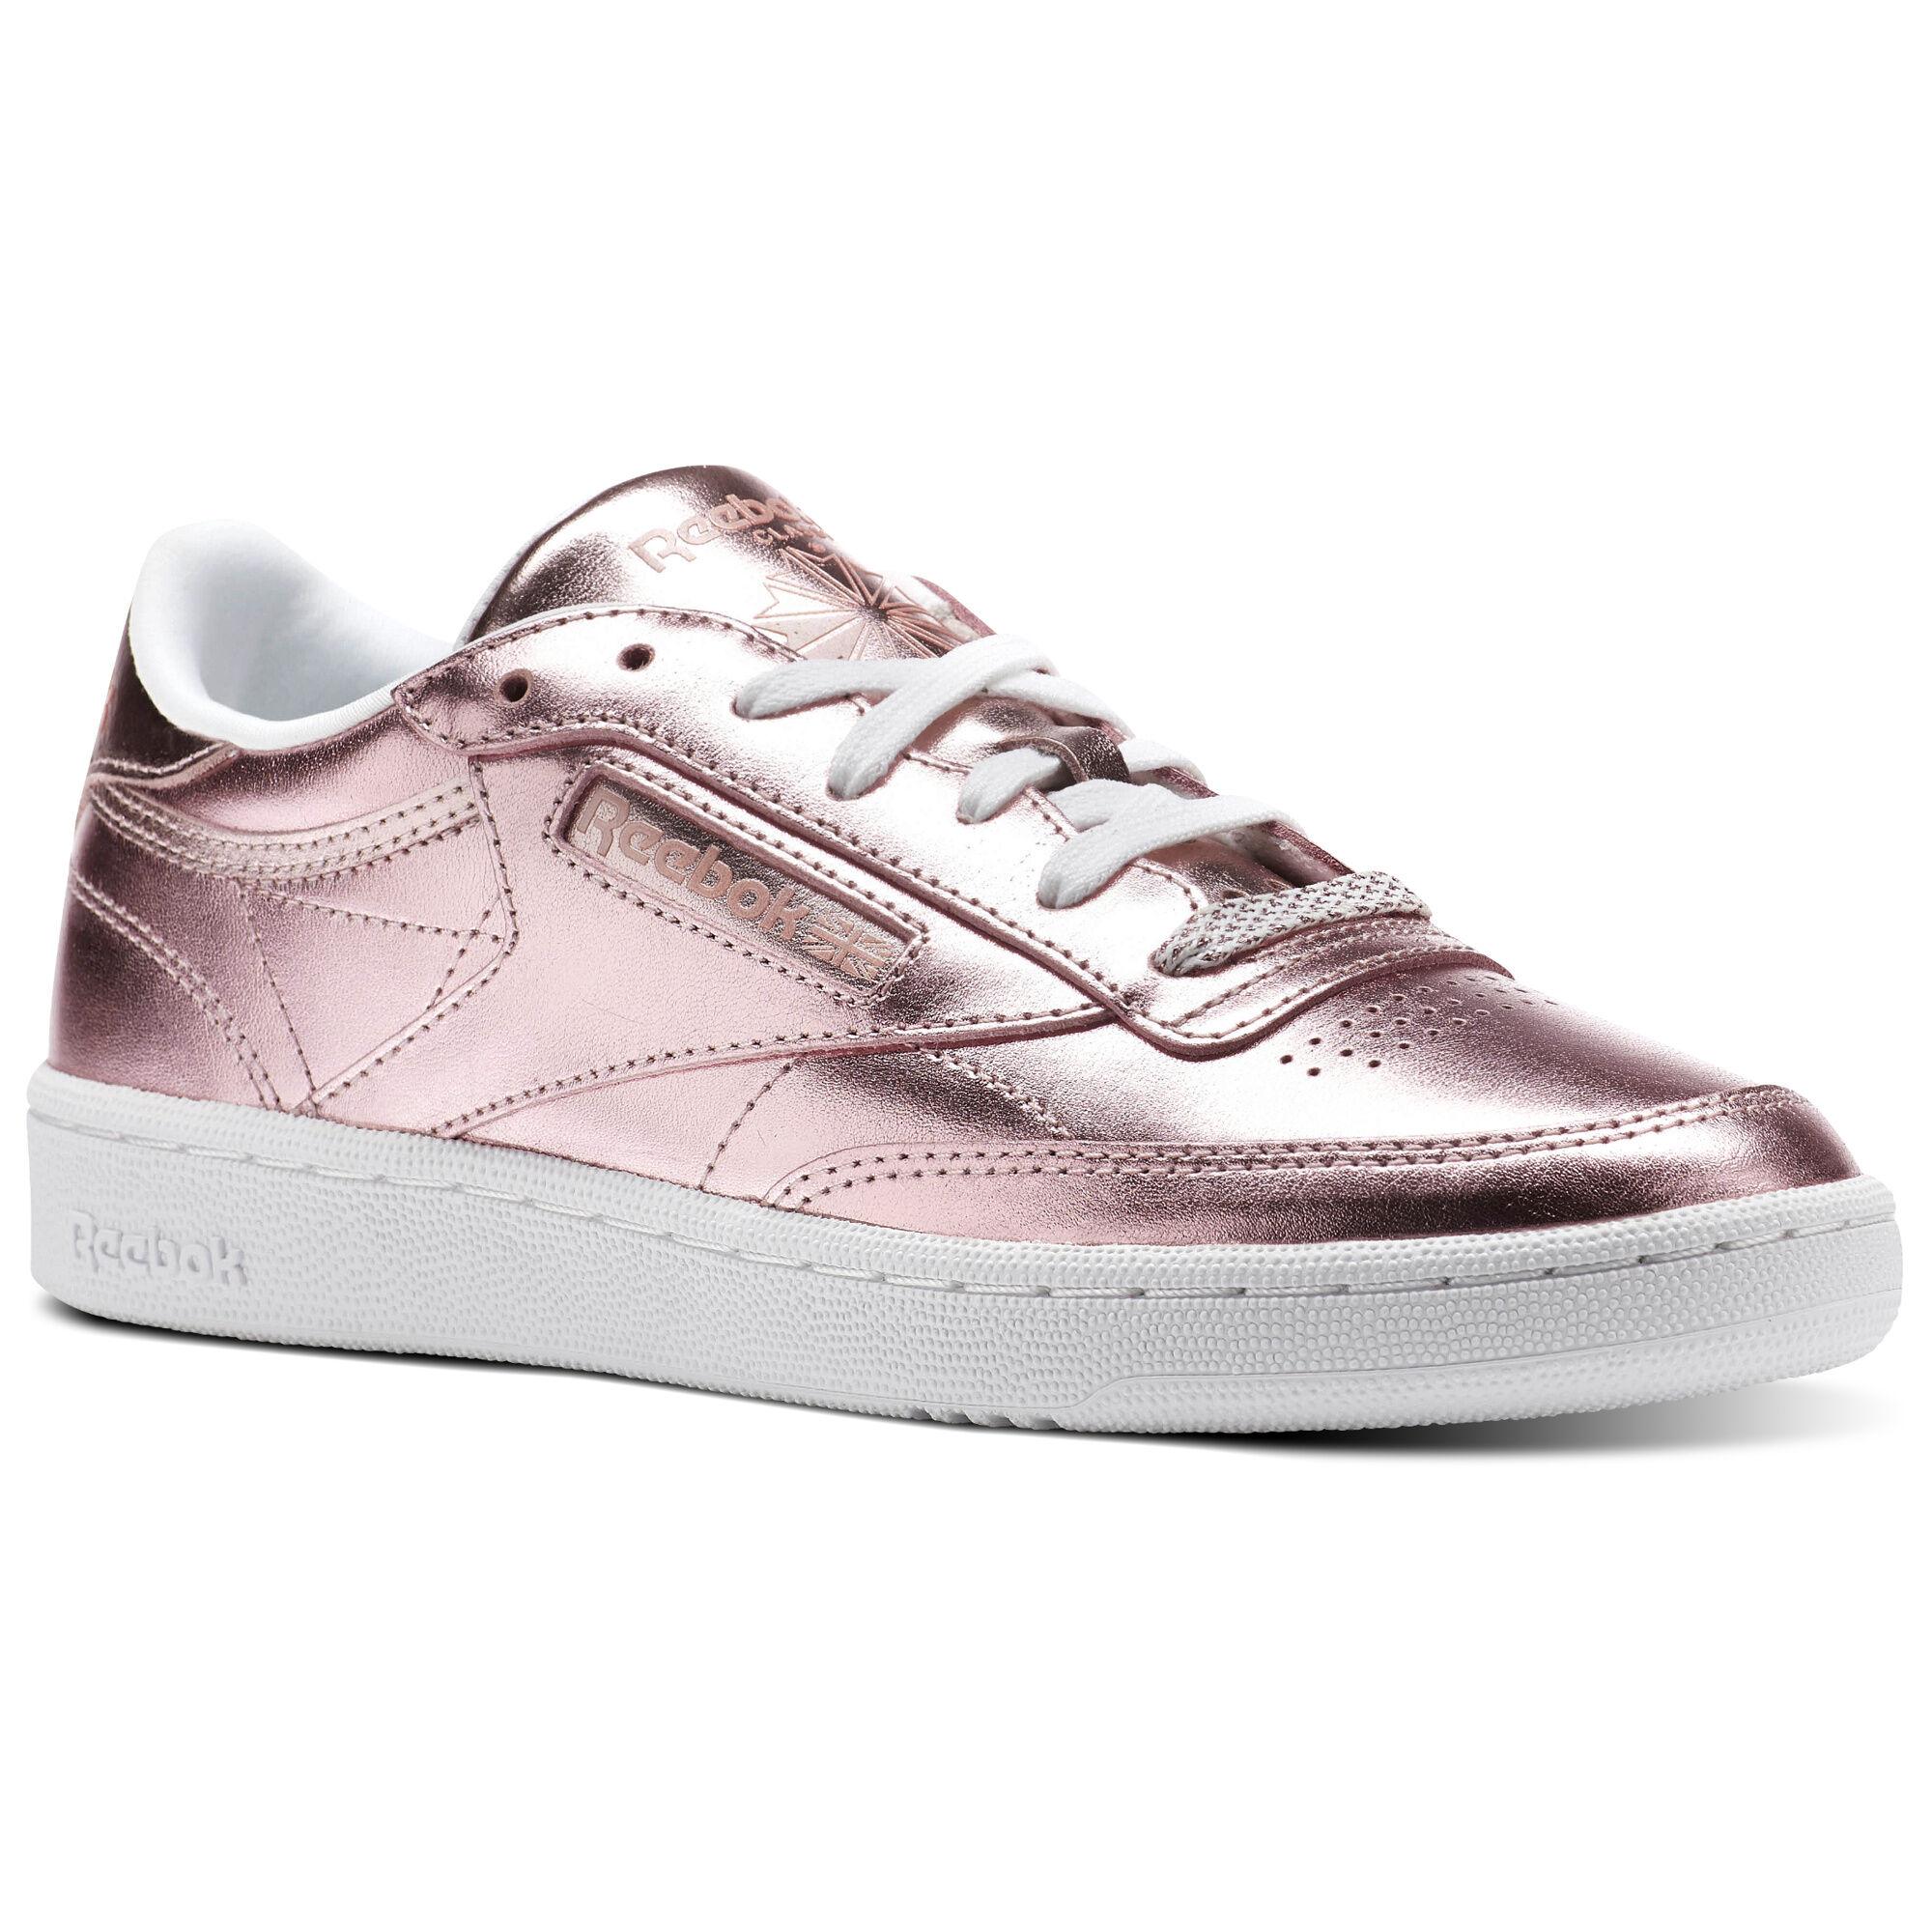 Reebok Club C 85 S Shine - Pink